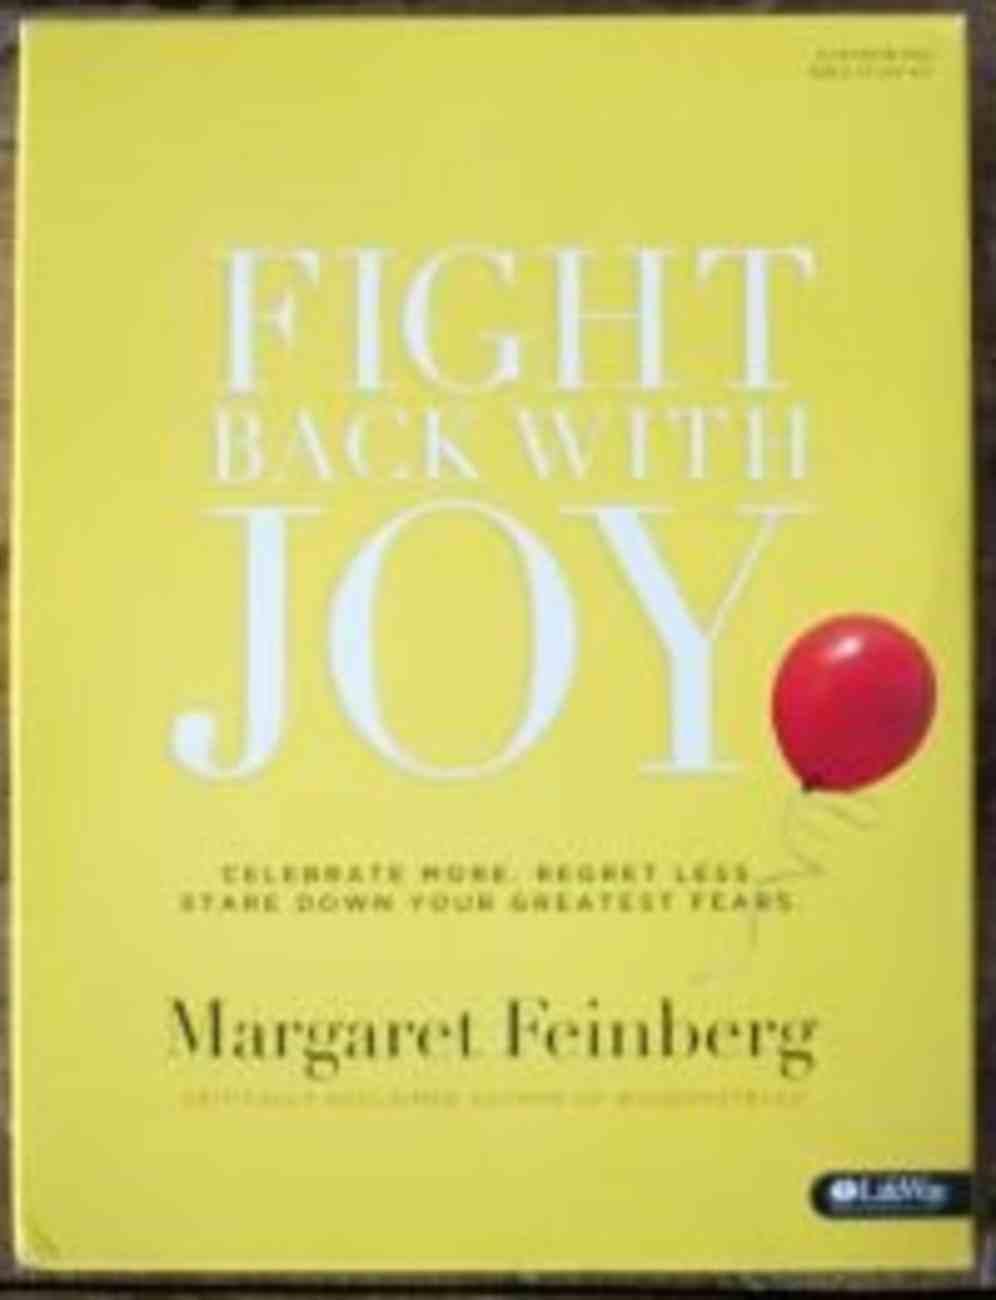 Fight Back With Joy (2 Dvds) (Dvd Only Set) DVD